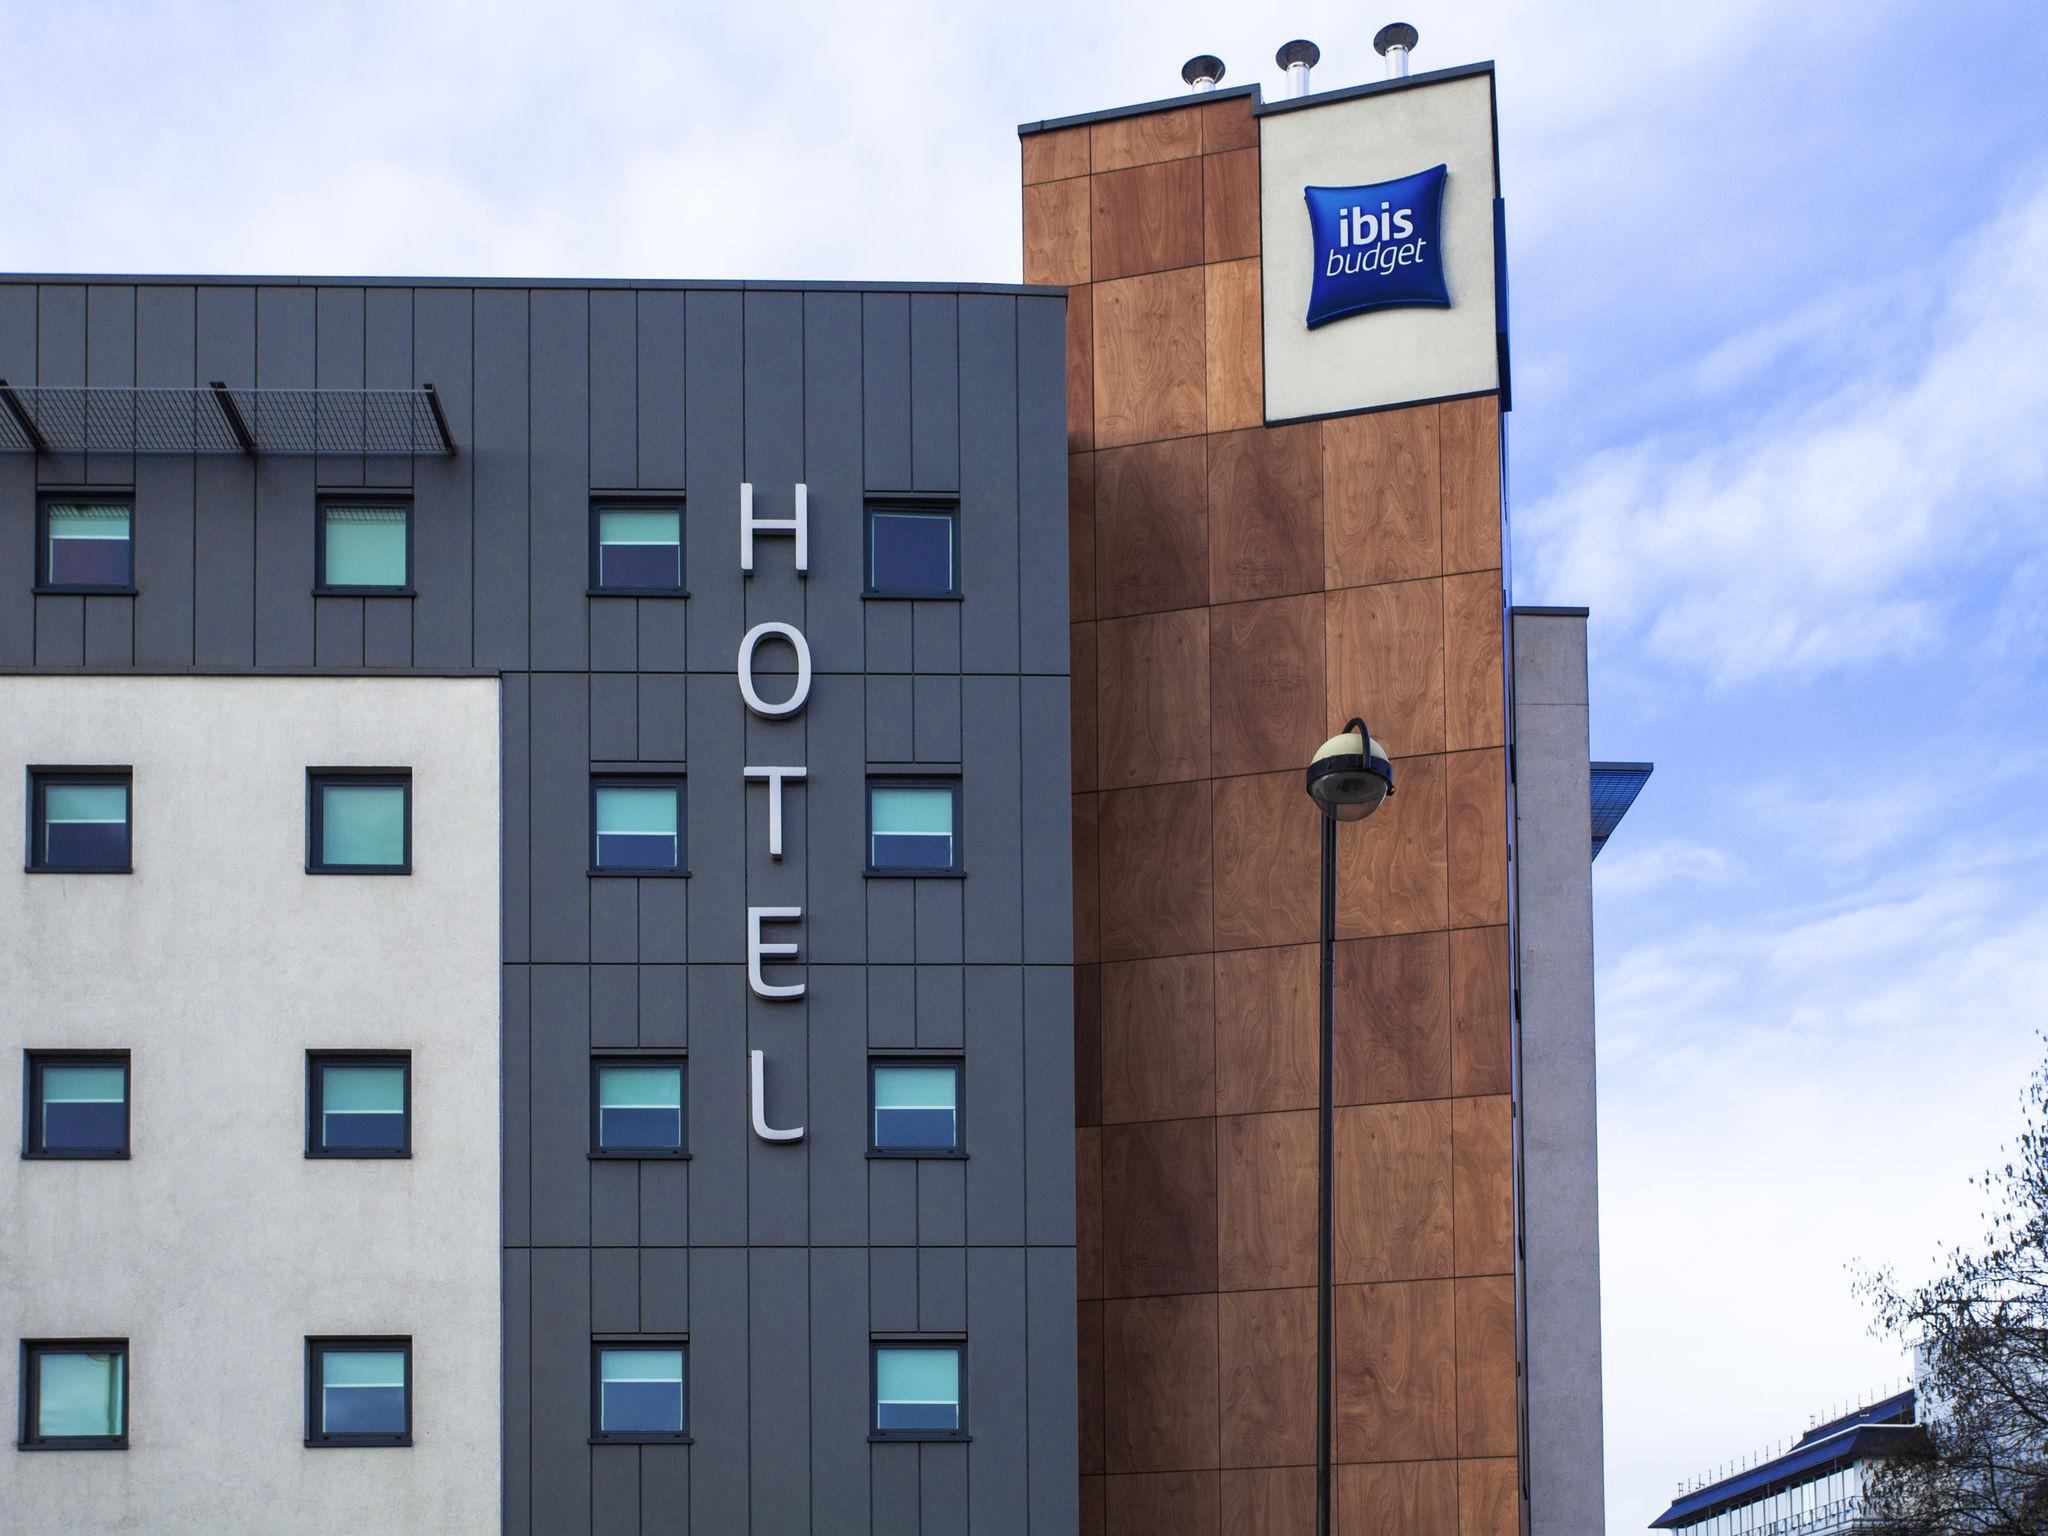 Hotel – ibis budget London Hounslow